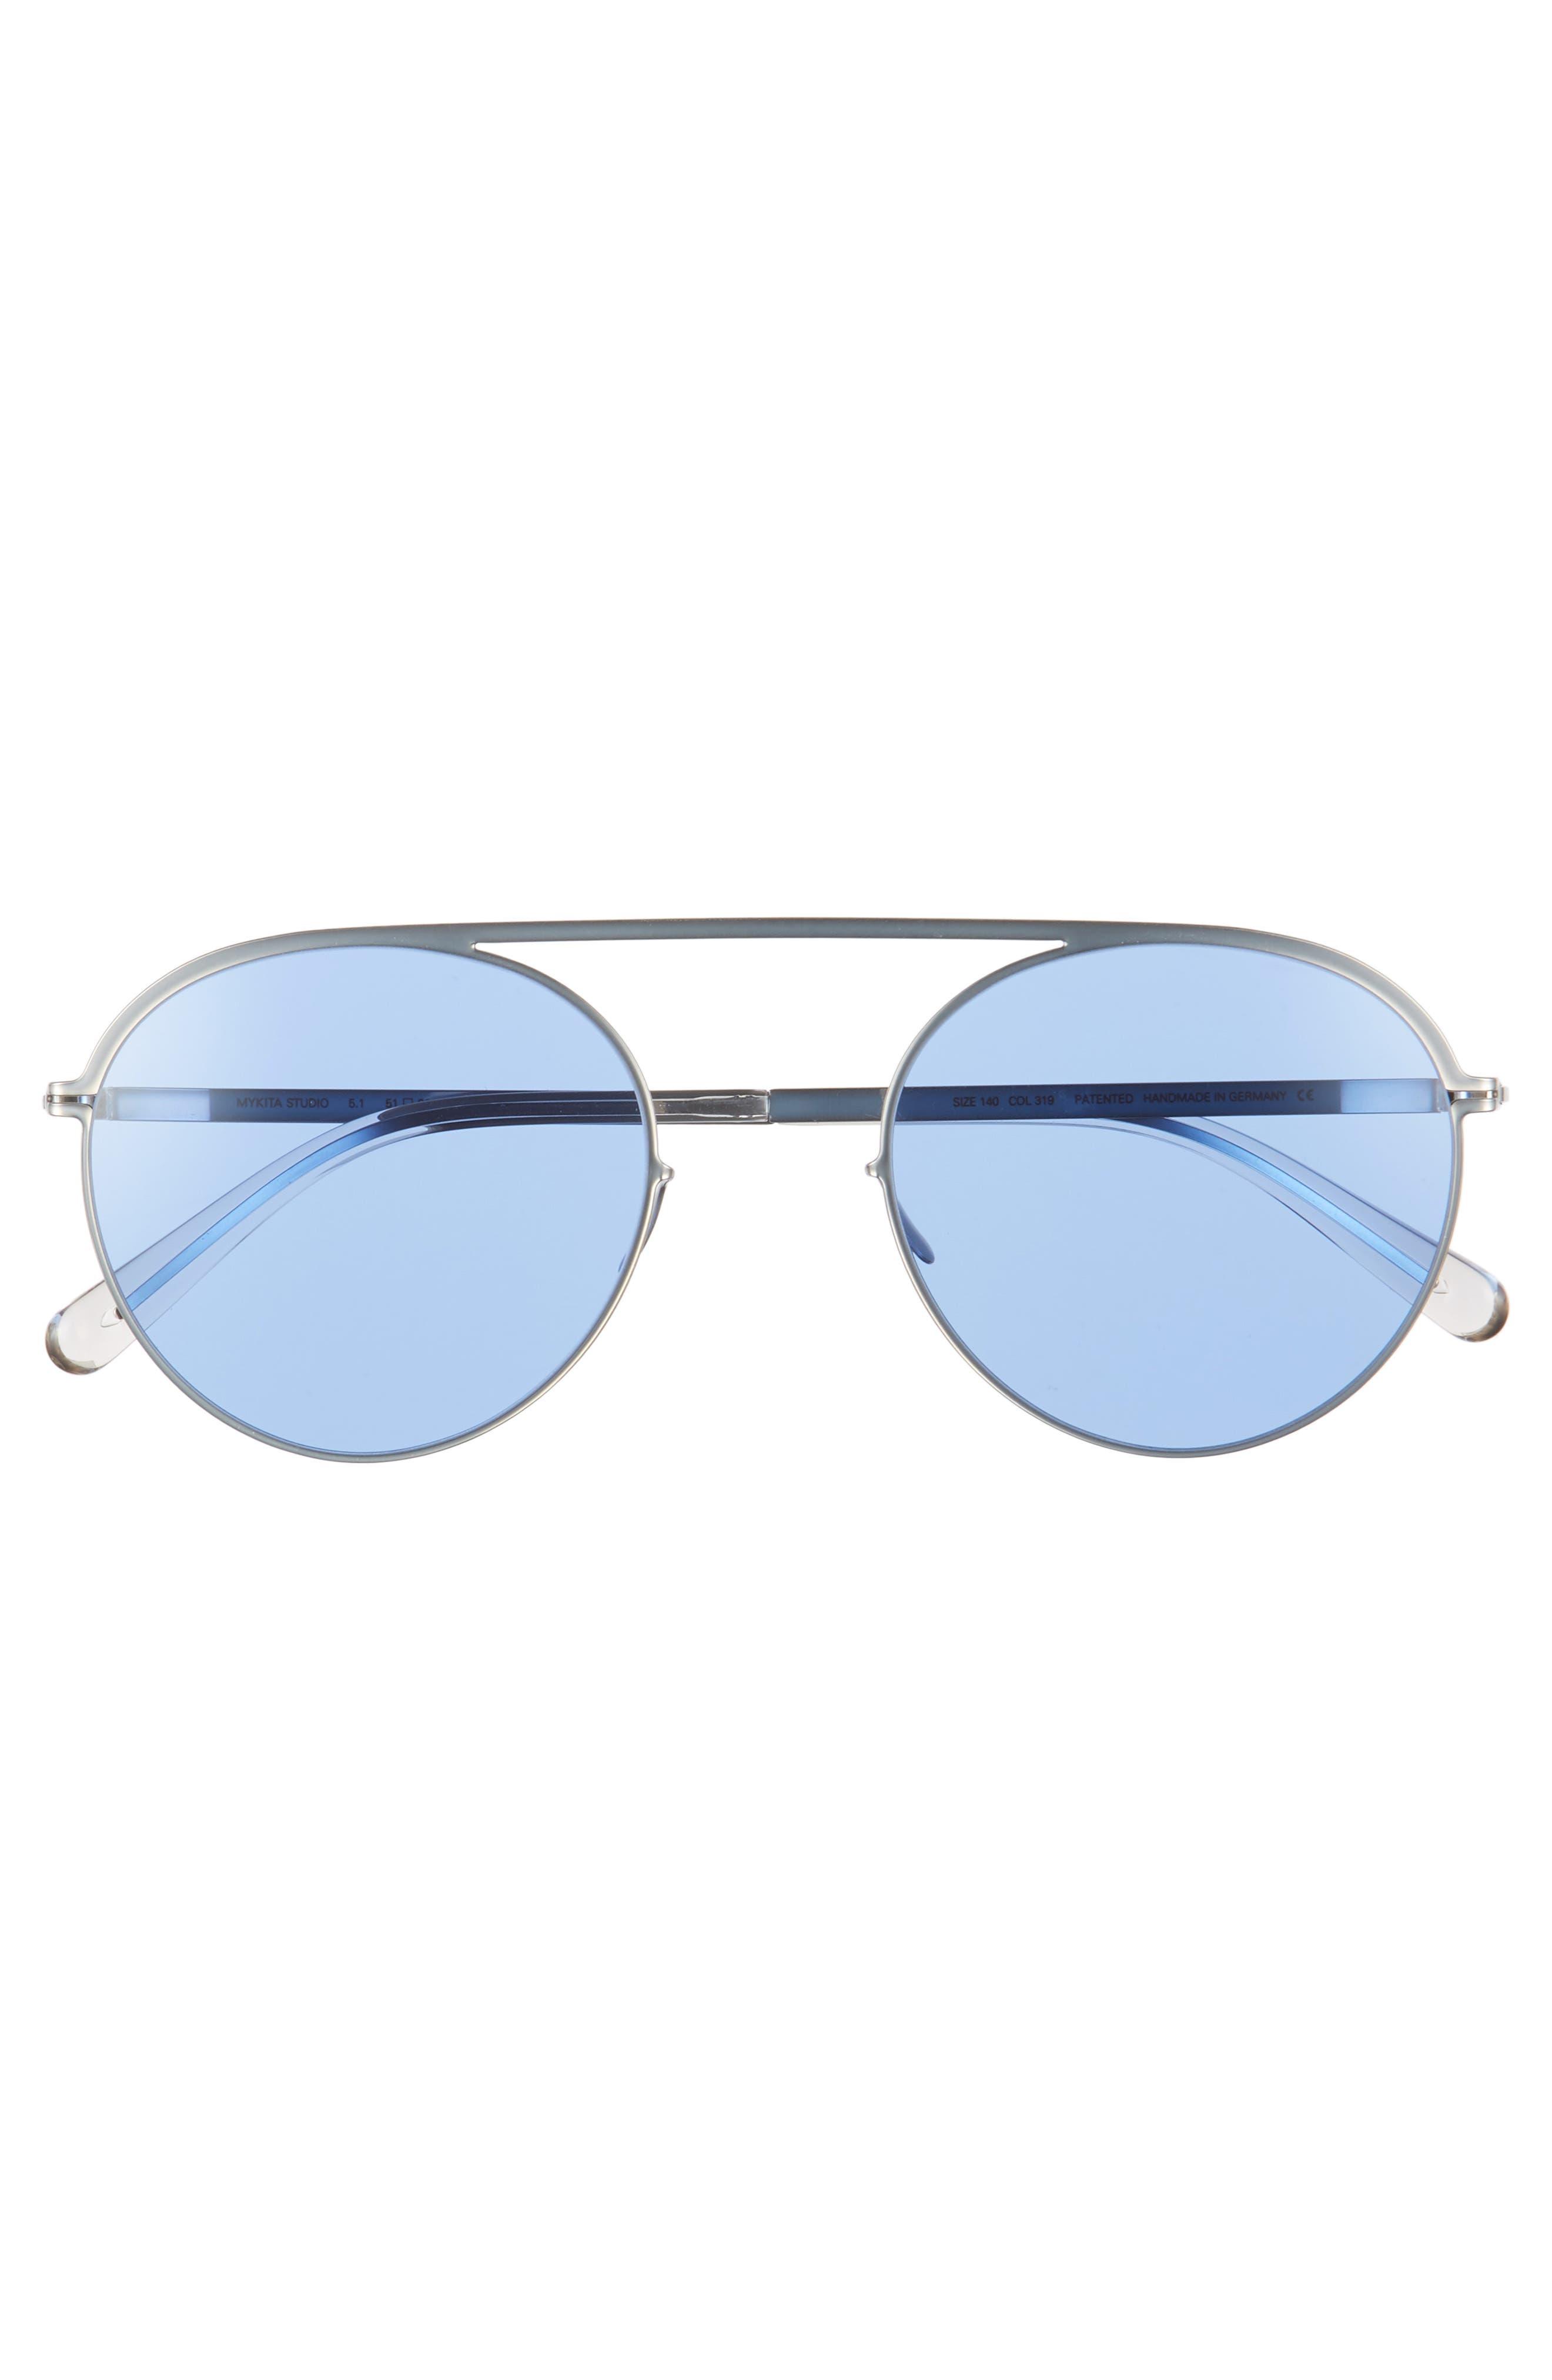 Studio 5.1 51mm Sunglasses,                             Alternate thumbnail 2, color,                             Silver